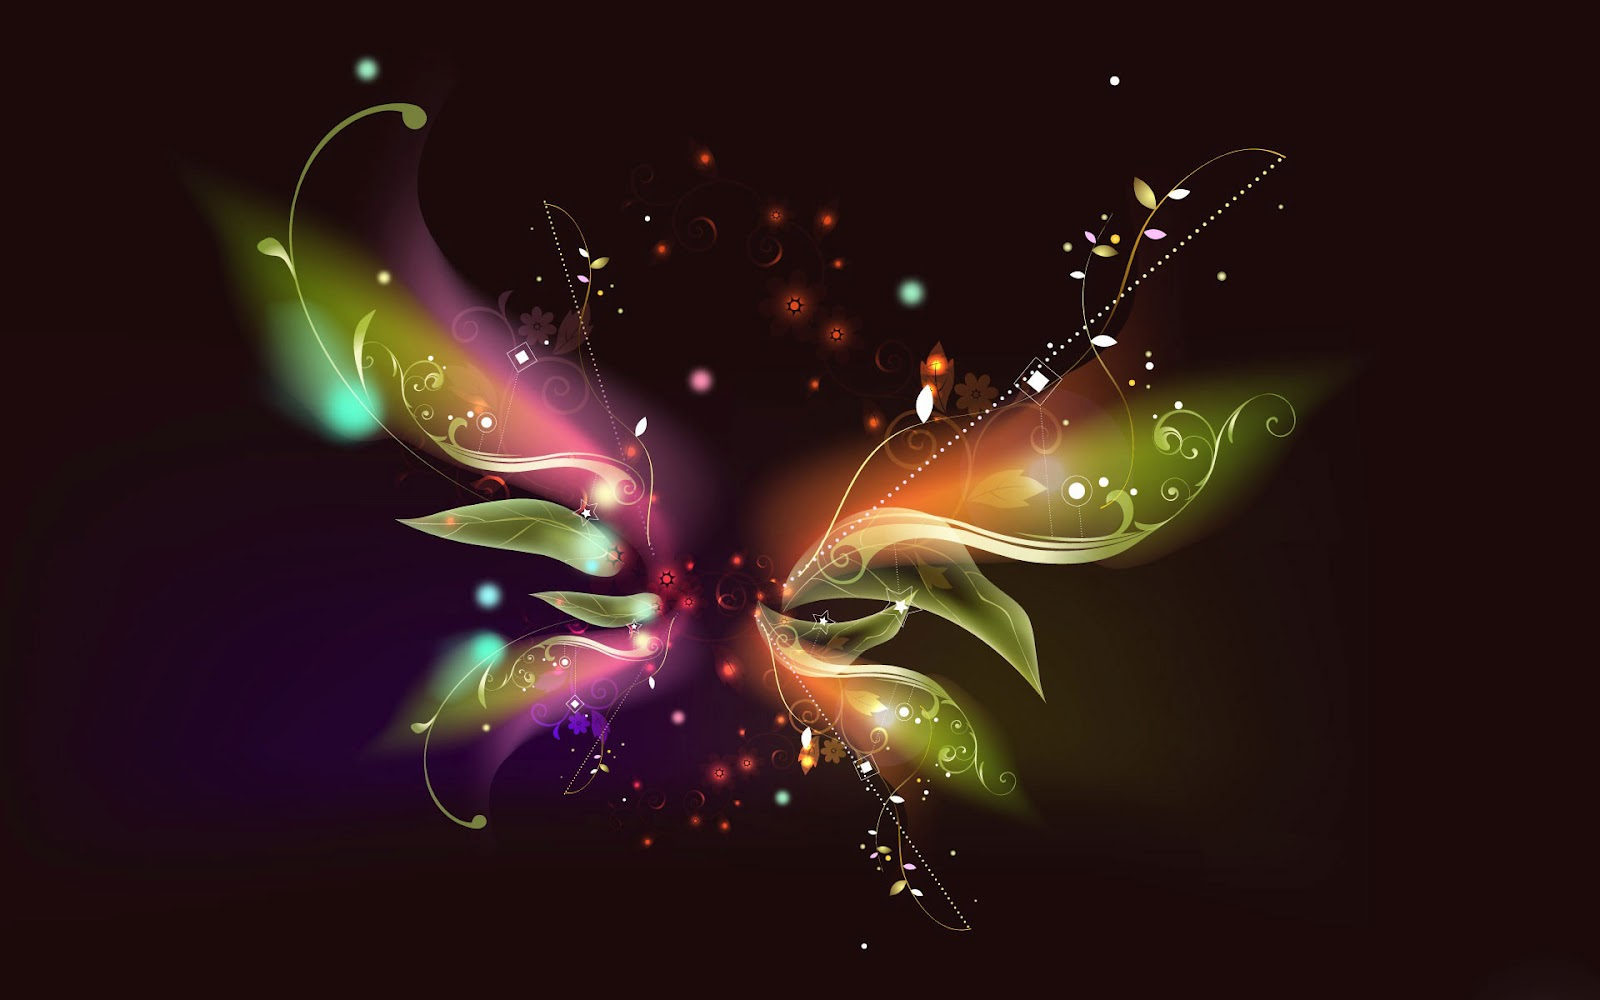 http://3.bp.blogspot.com/-y5GWU9bMjYg/T1lmMk32iKI/AAAAAAAAAQA/HivcnHKnOBM/s1600/3D+Wallpaper+Backgrounds.jpg